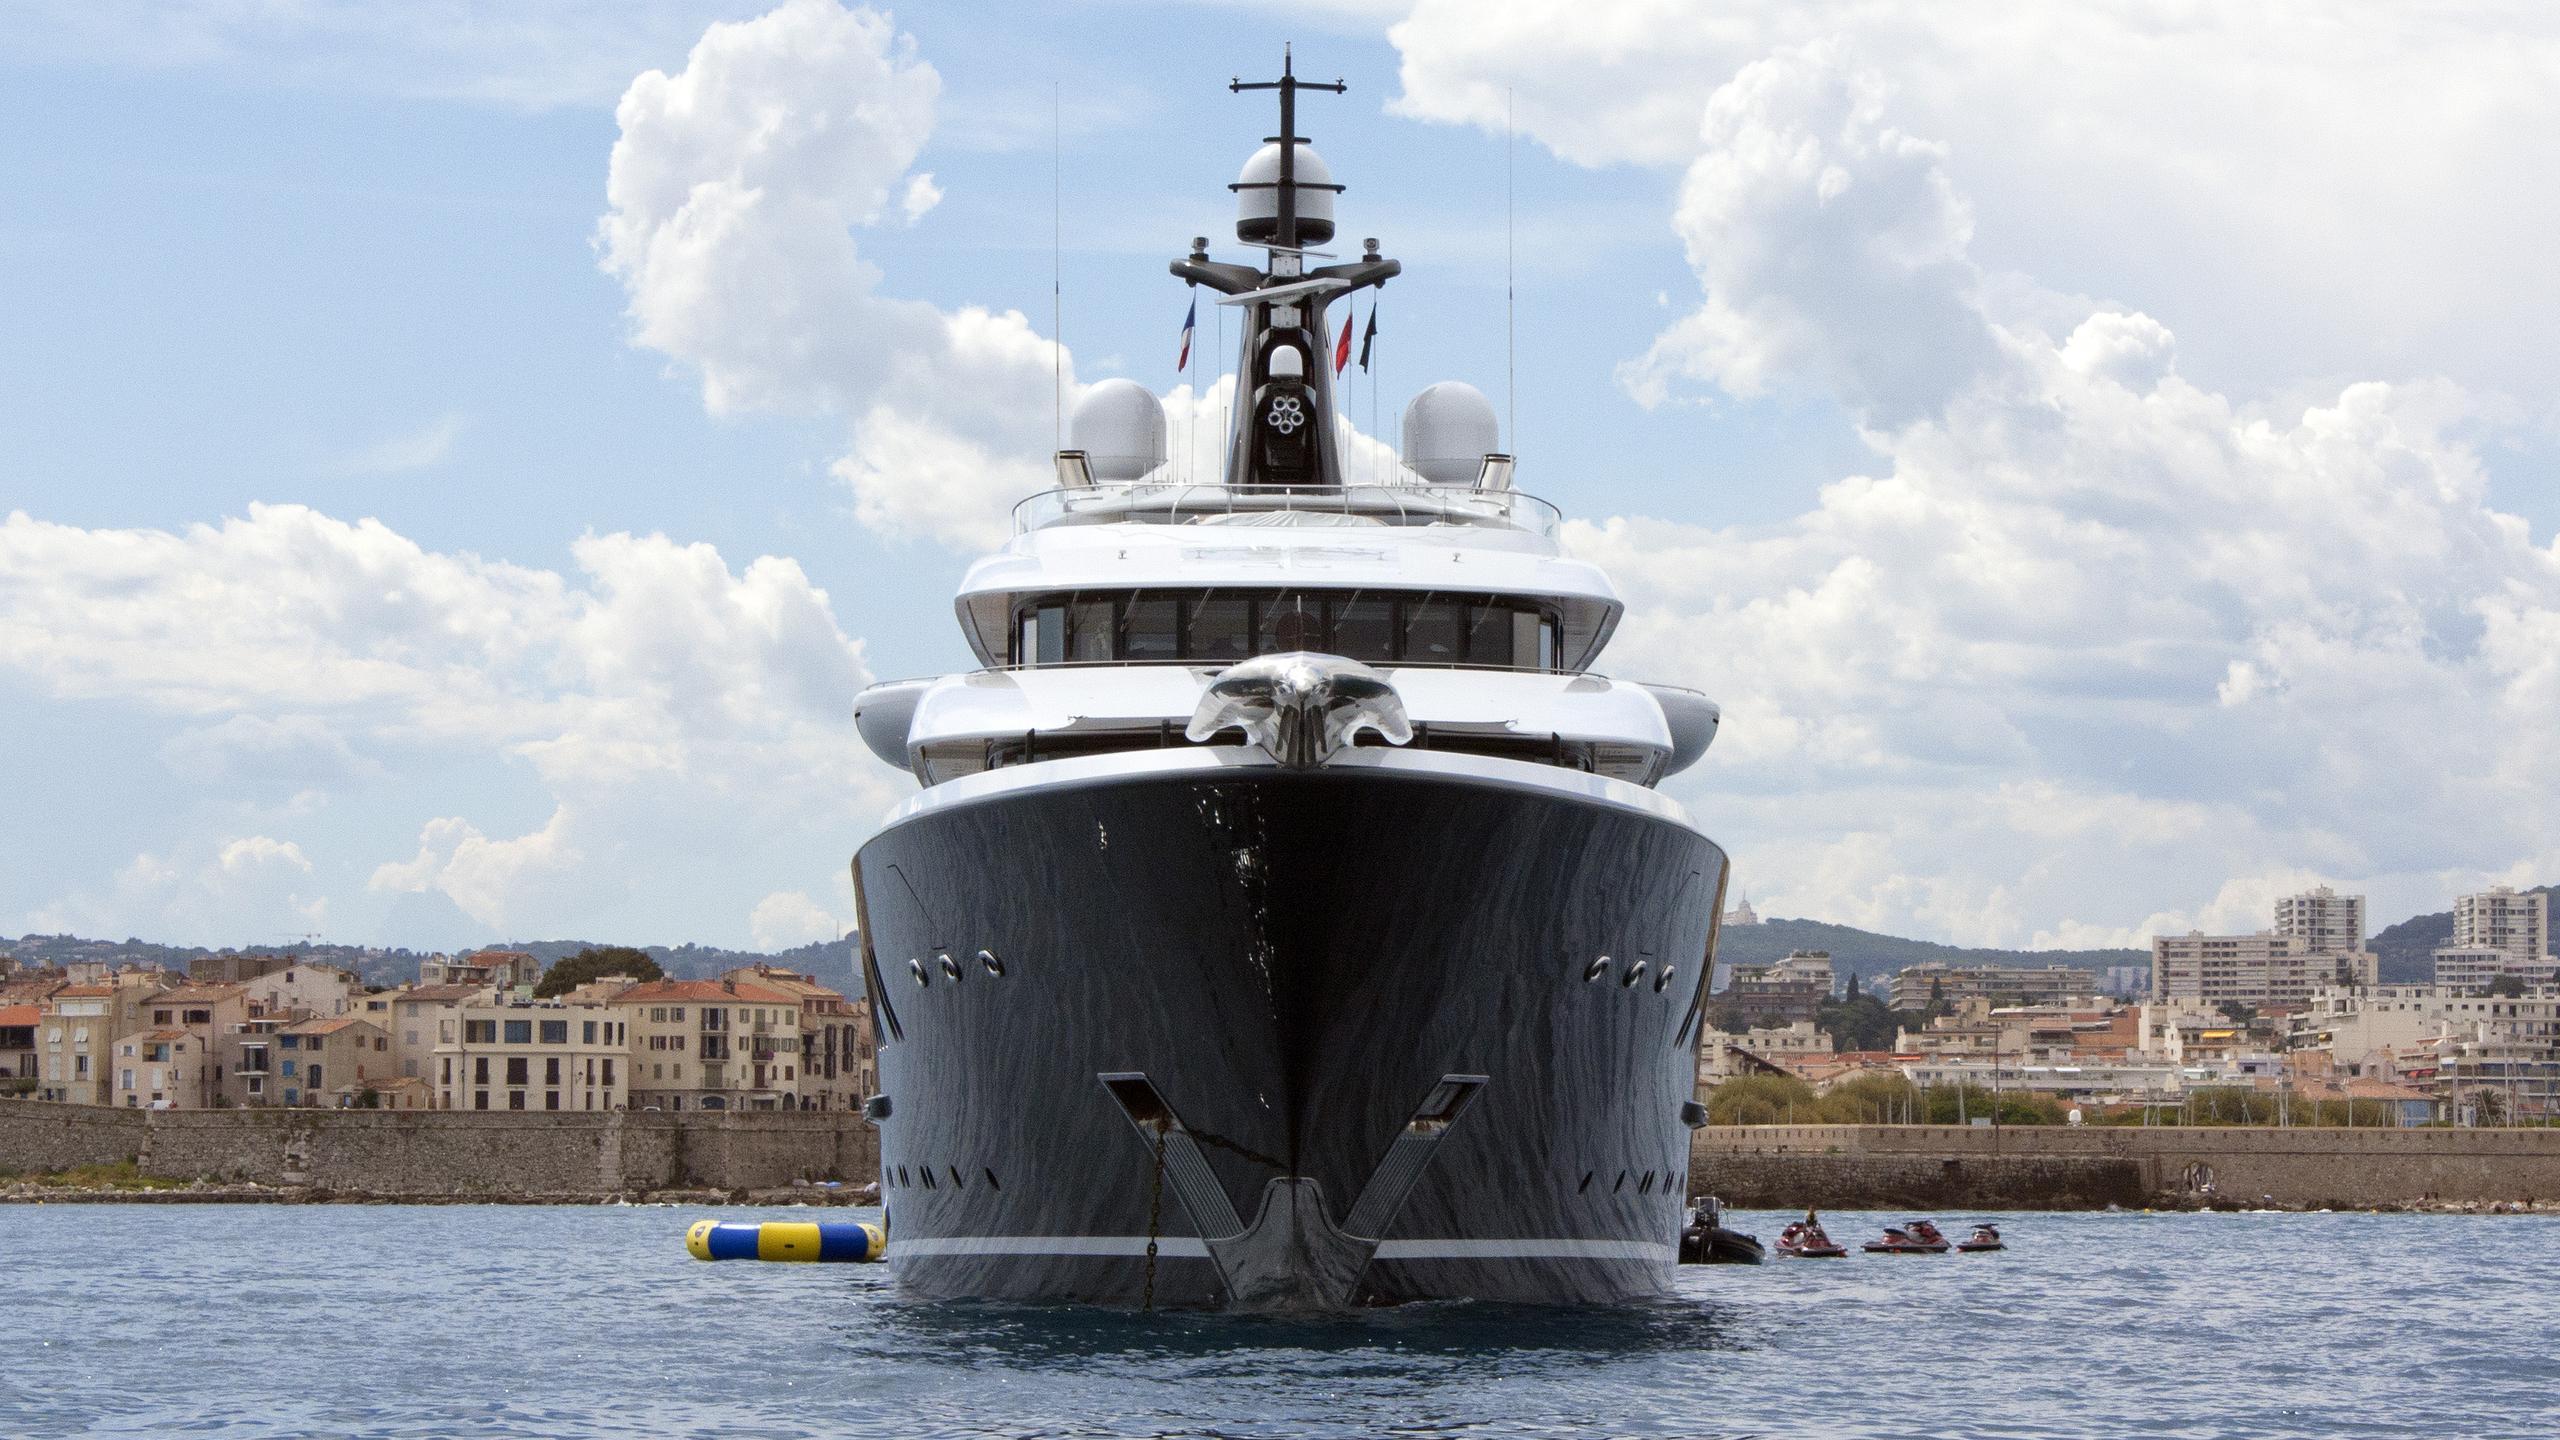 phoenix-2-motor-yacht-lurssen-2010-90m-bow